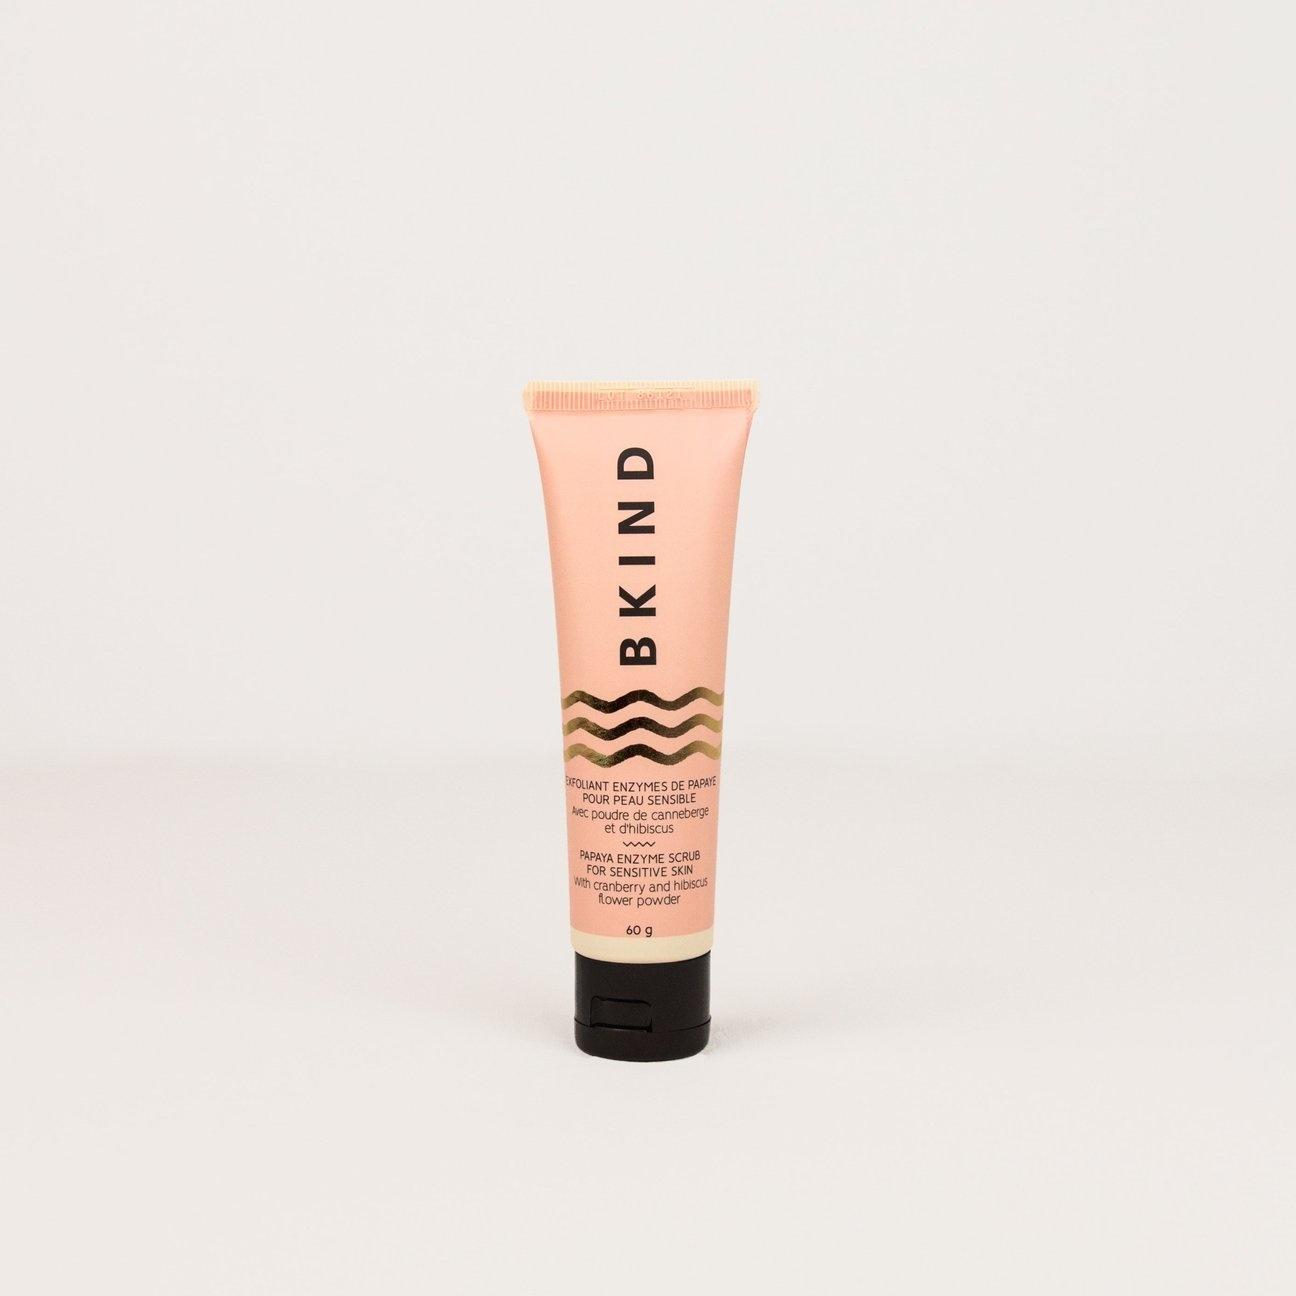 BKIND Face scrub for sensitive skin